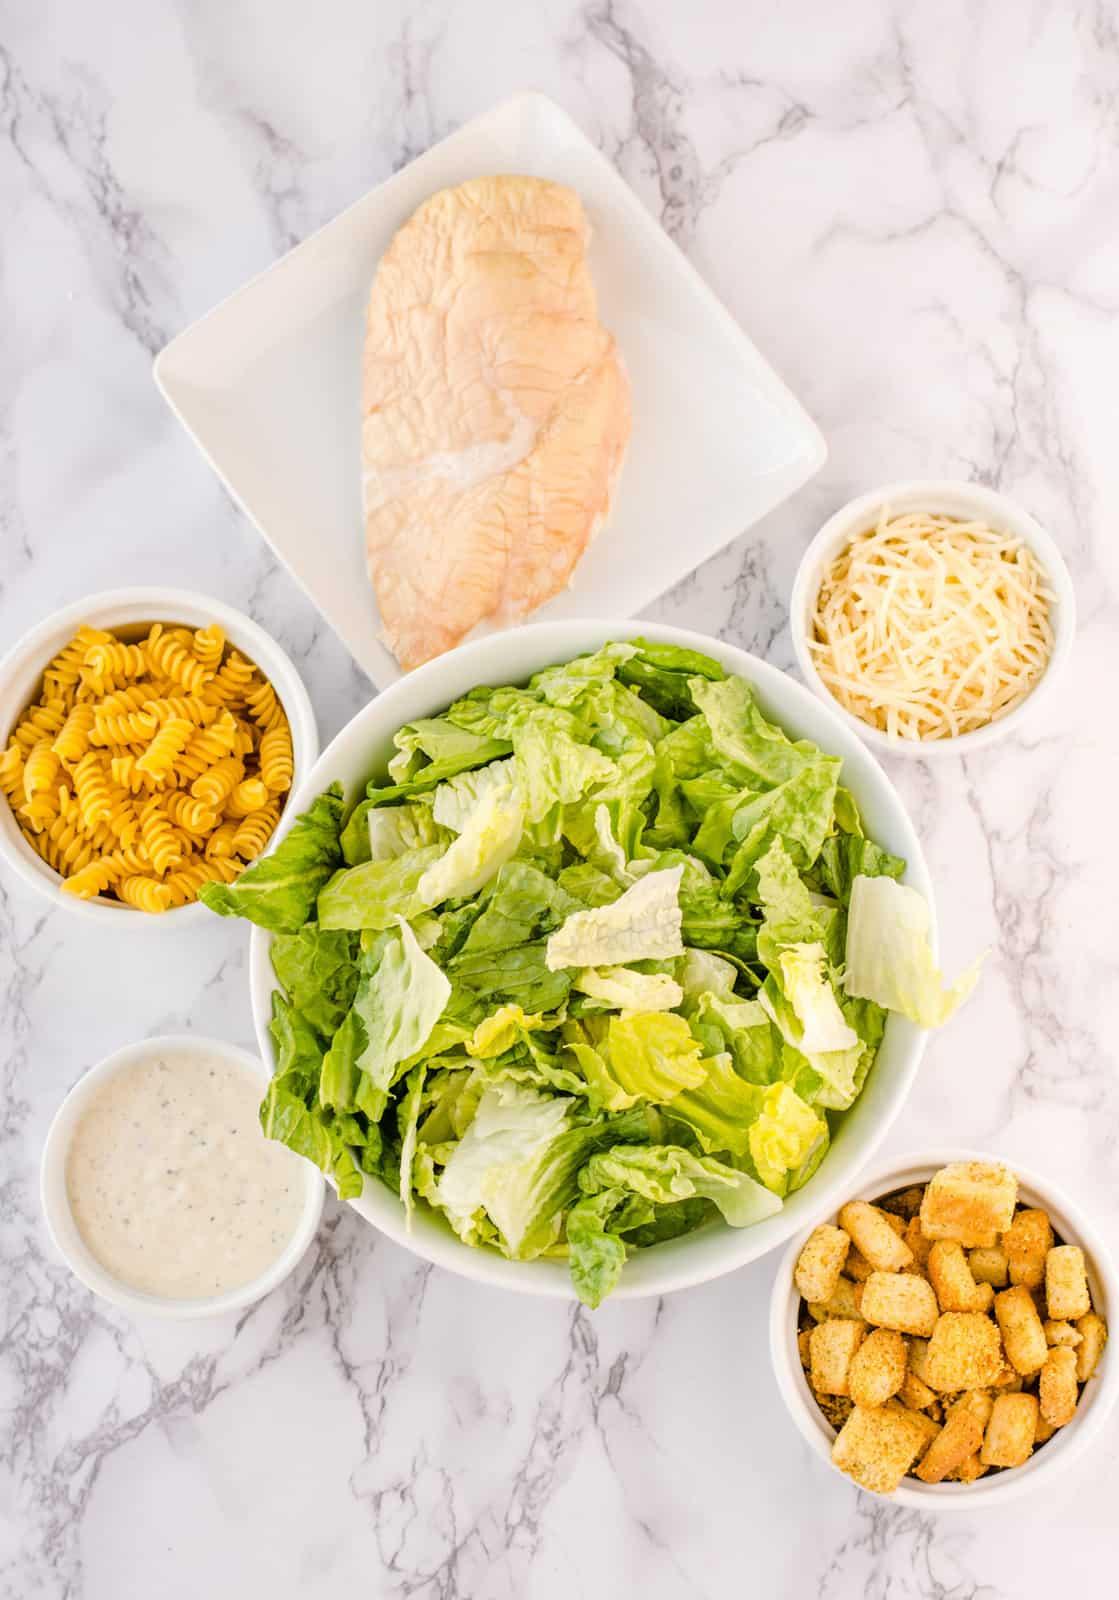 Ingredients needed to make Caesar Pasta Salad